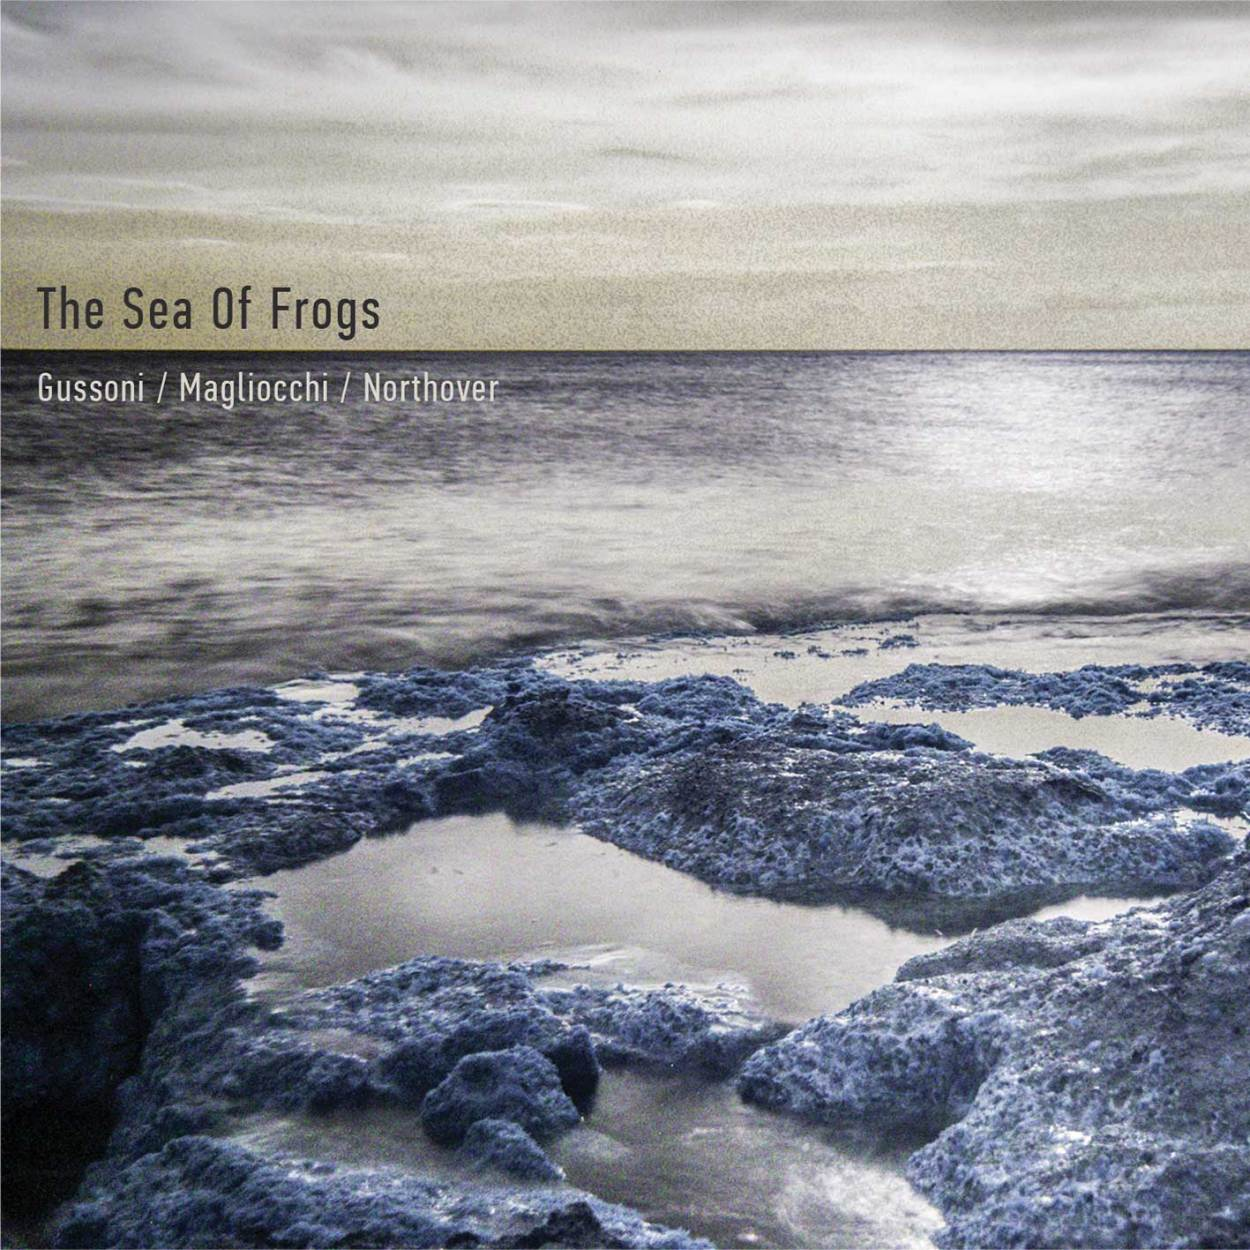 Gussoni / Magliocchi / Northover – The Sea Of Frogs